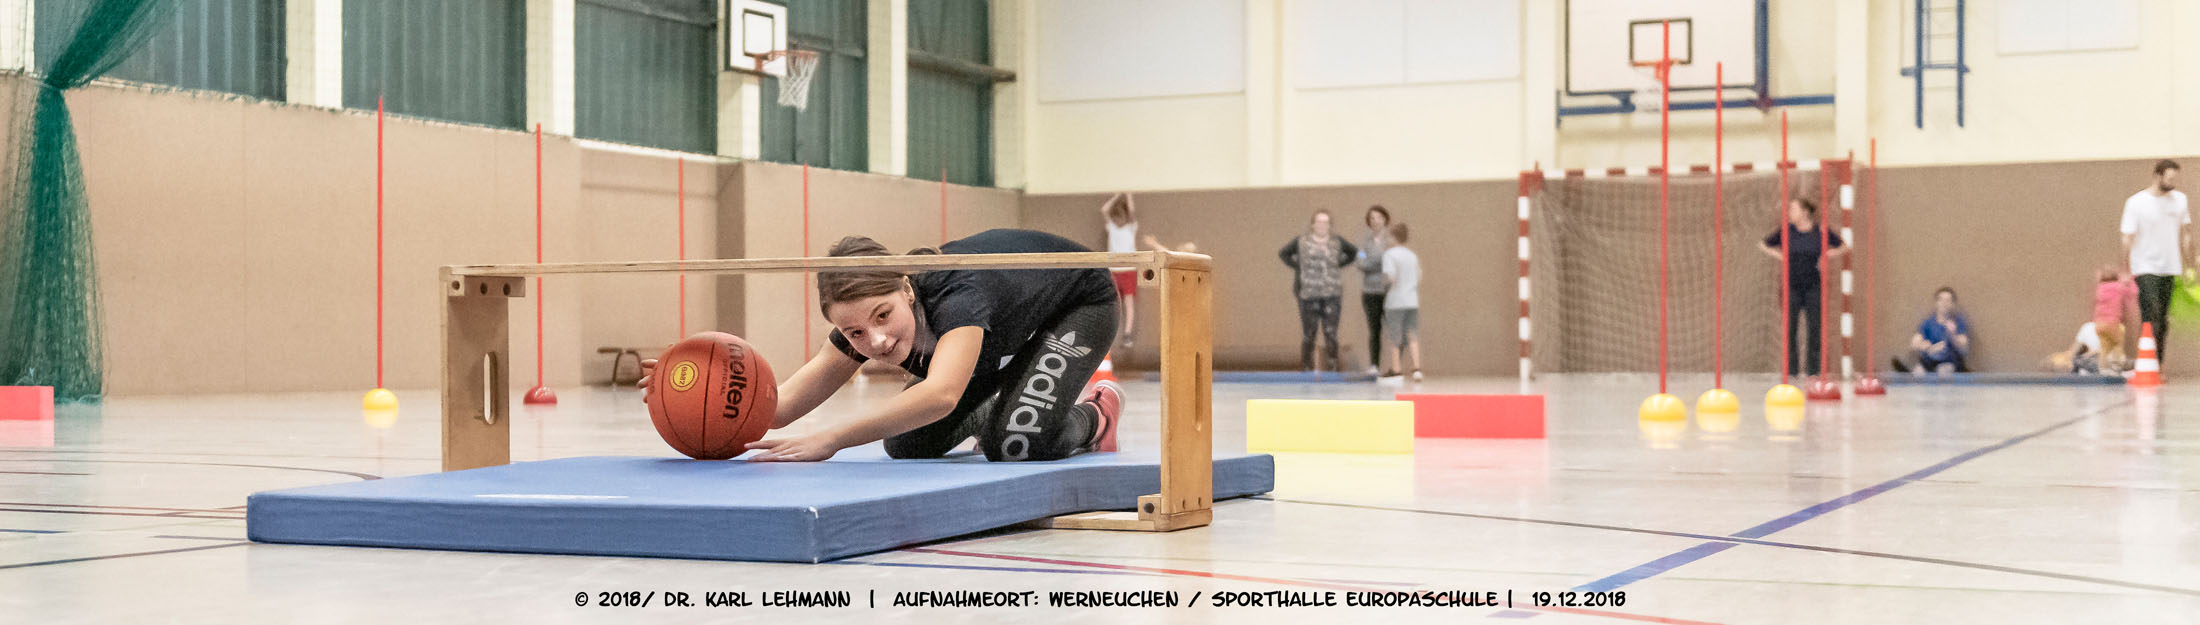 Training in der Europaschule